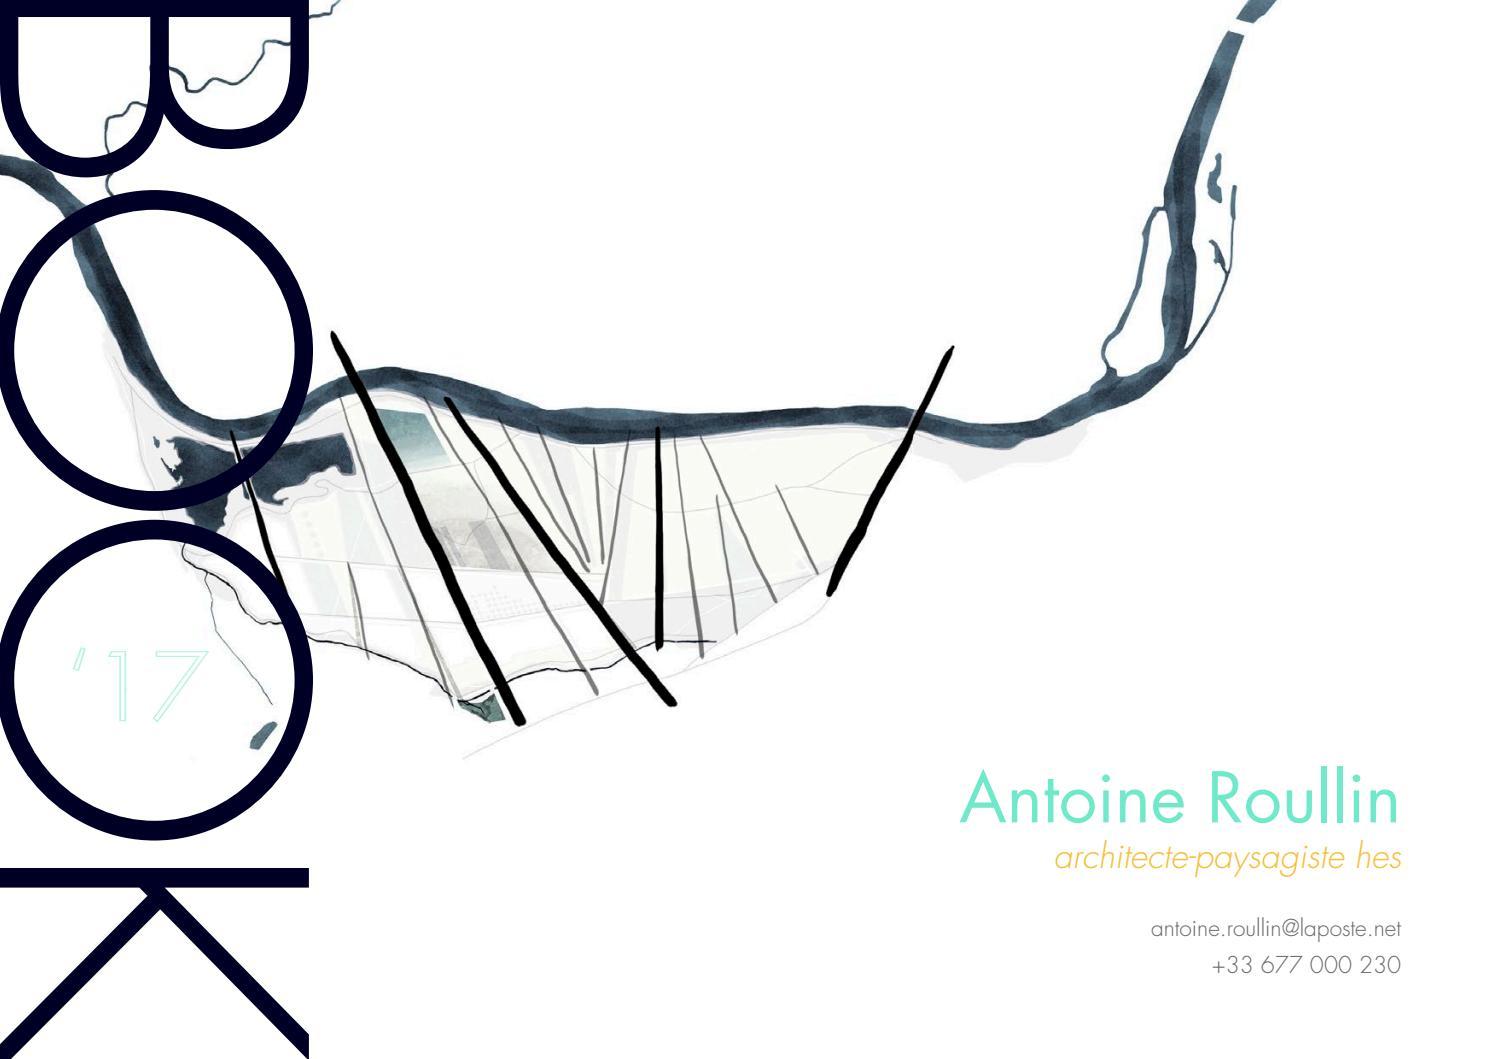 antoine roullin architecte-paysagiste - book 2017antoine roullin